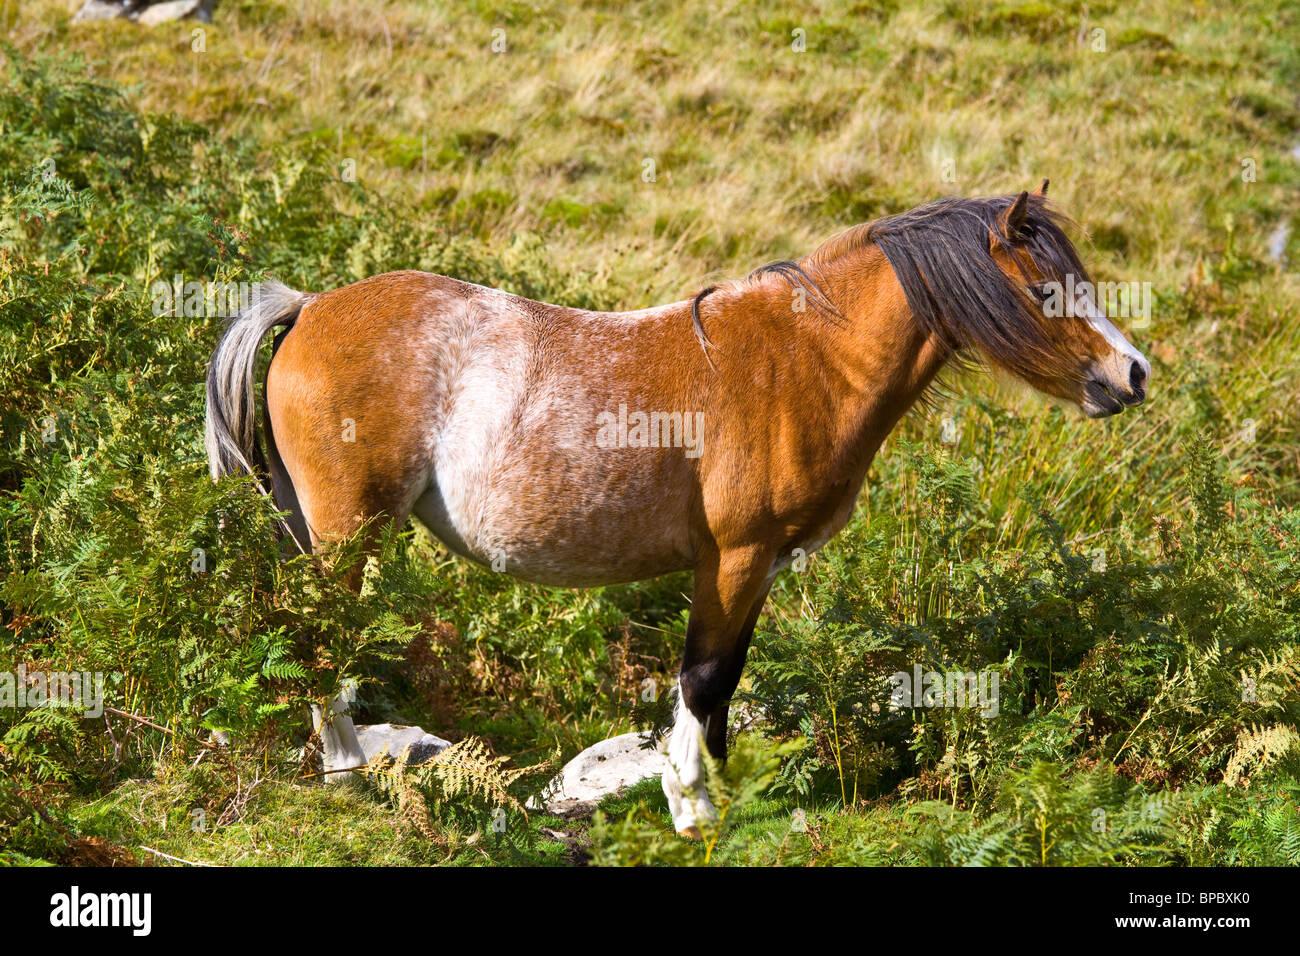 Chestnut roan pony cob trotting on brecon moors - Stock Image